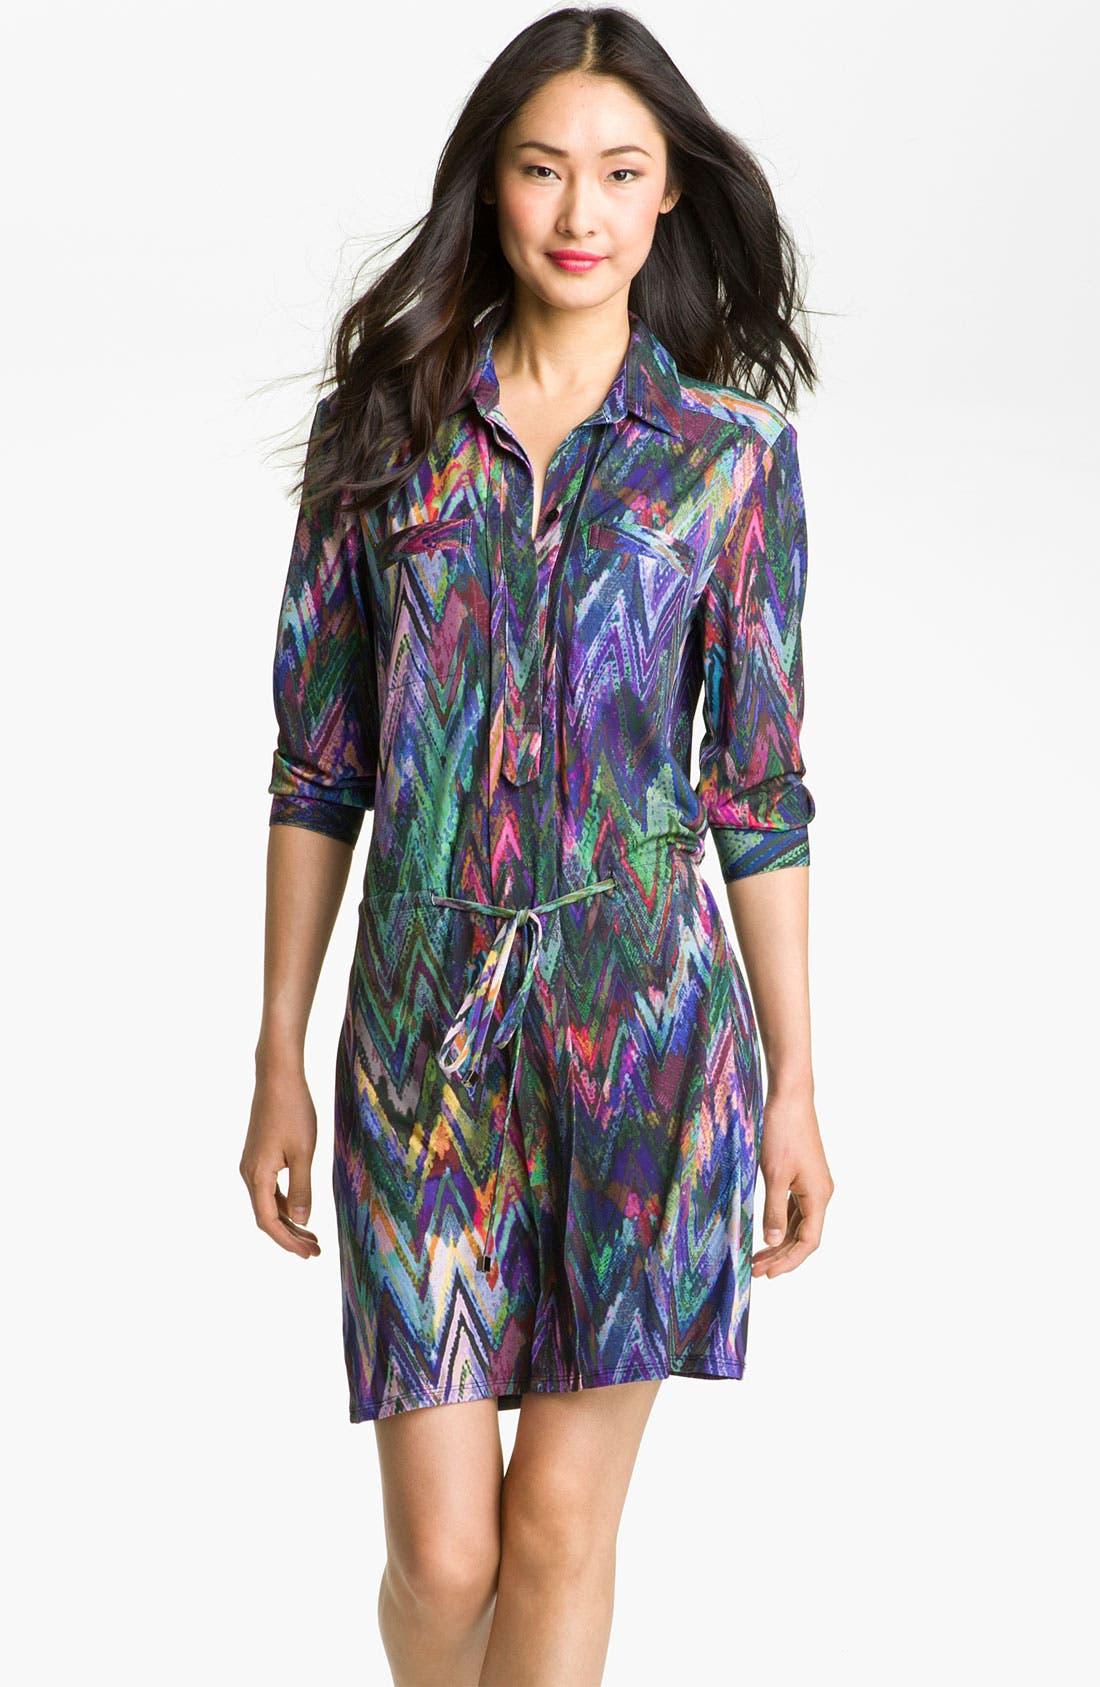 Main Image - Suzi Chin for Maggy Boutique Print Jersey Shirtdress (Petite)